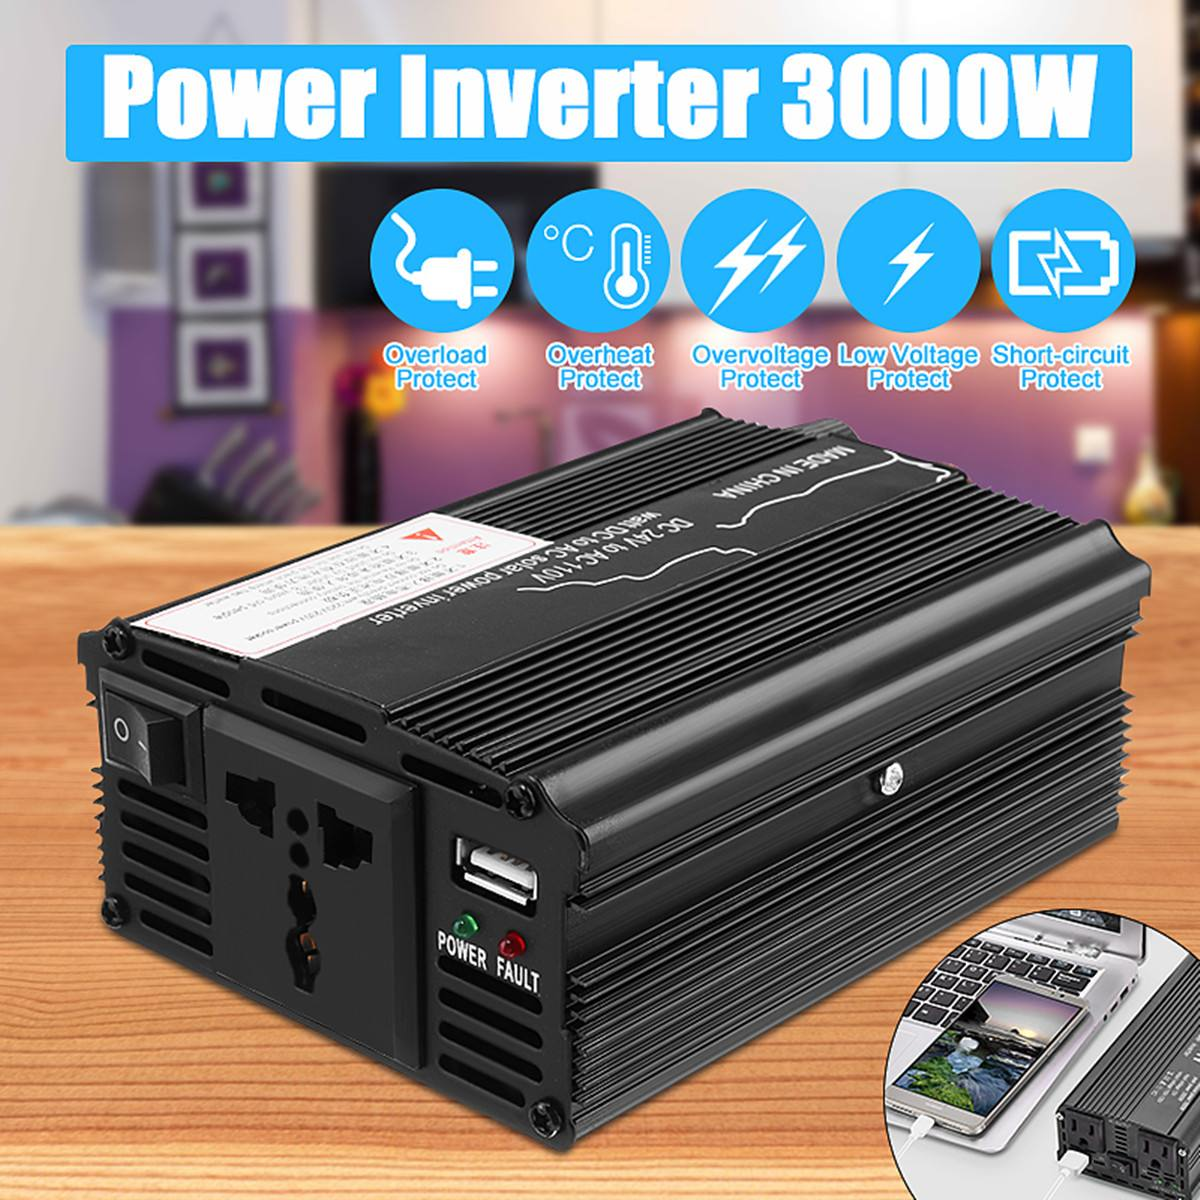 12V 220V 3000W Inverter Peaks Power Voltage Transformer Converter DC 12V To AC 220V Sine Wave Solar Inverter12V 220V 3000W Inverter Peaks Power Voltage Transformer Converter DC 12V To AC 220V Sine Wave Solar Inverter